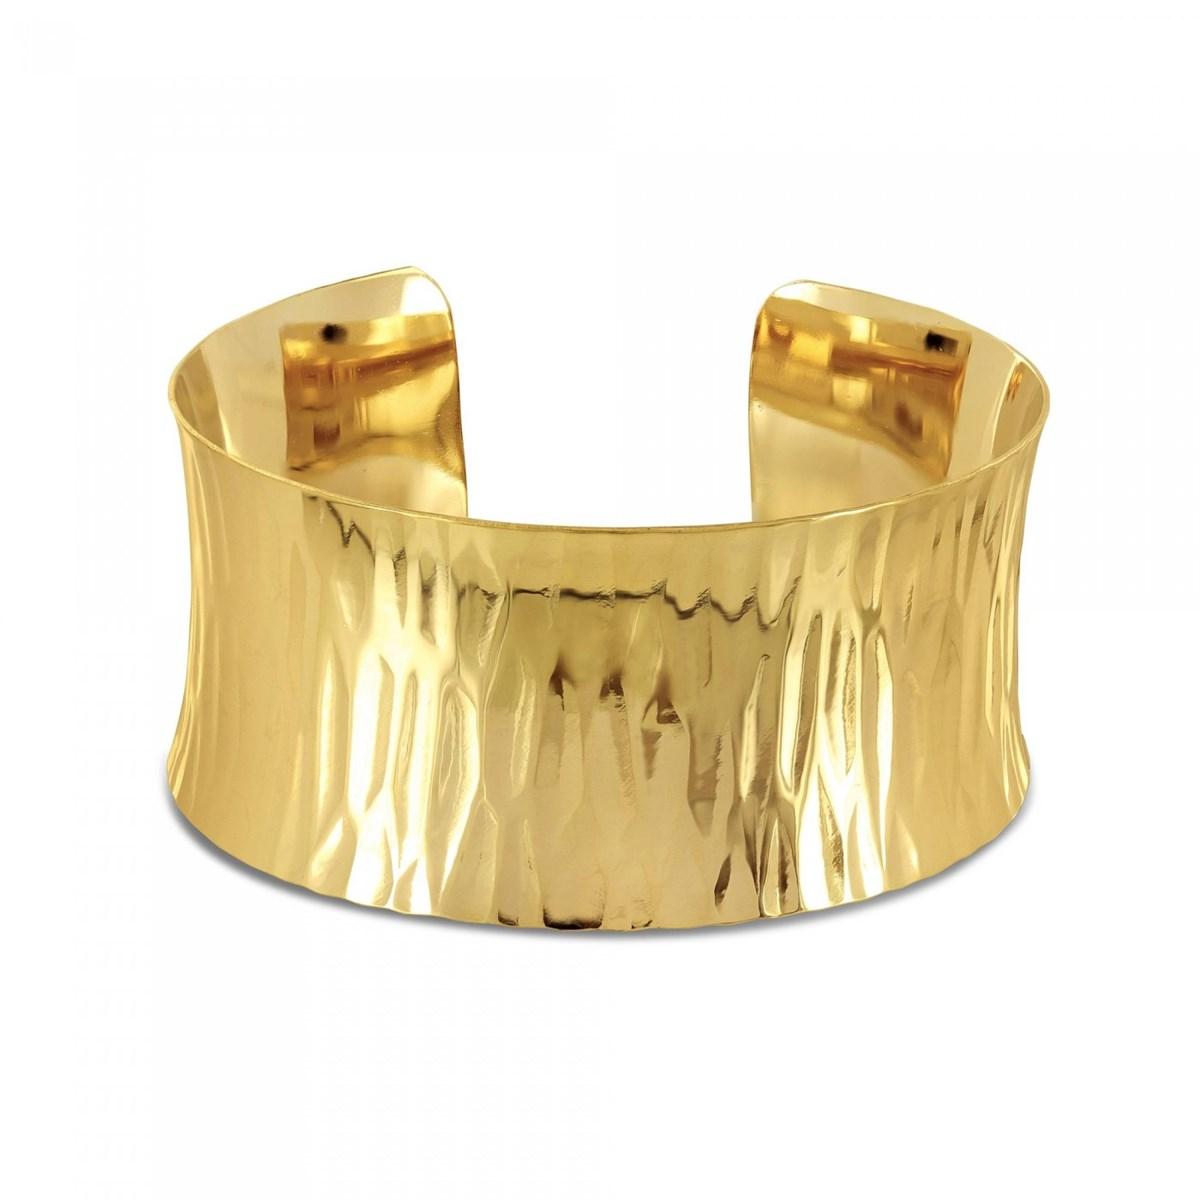 bracelet femme plaque or 18 carats